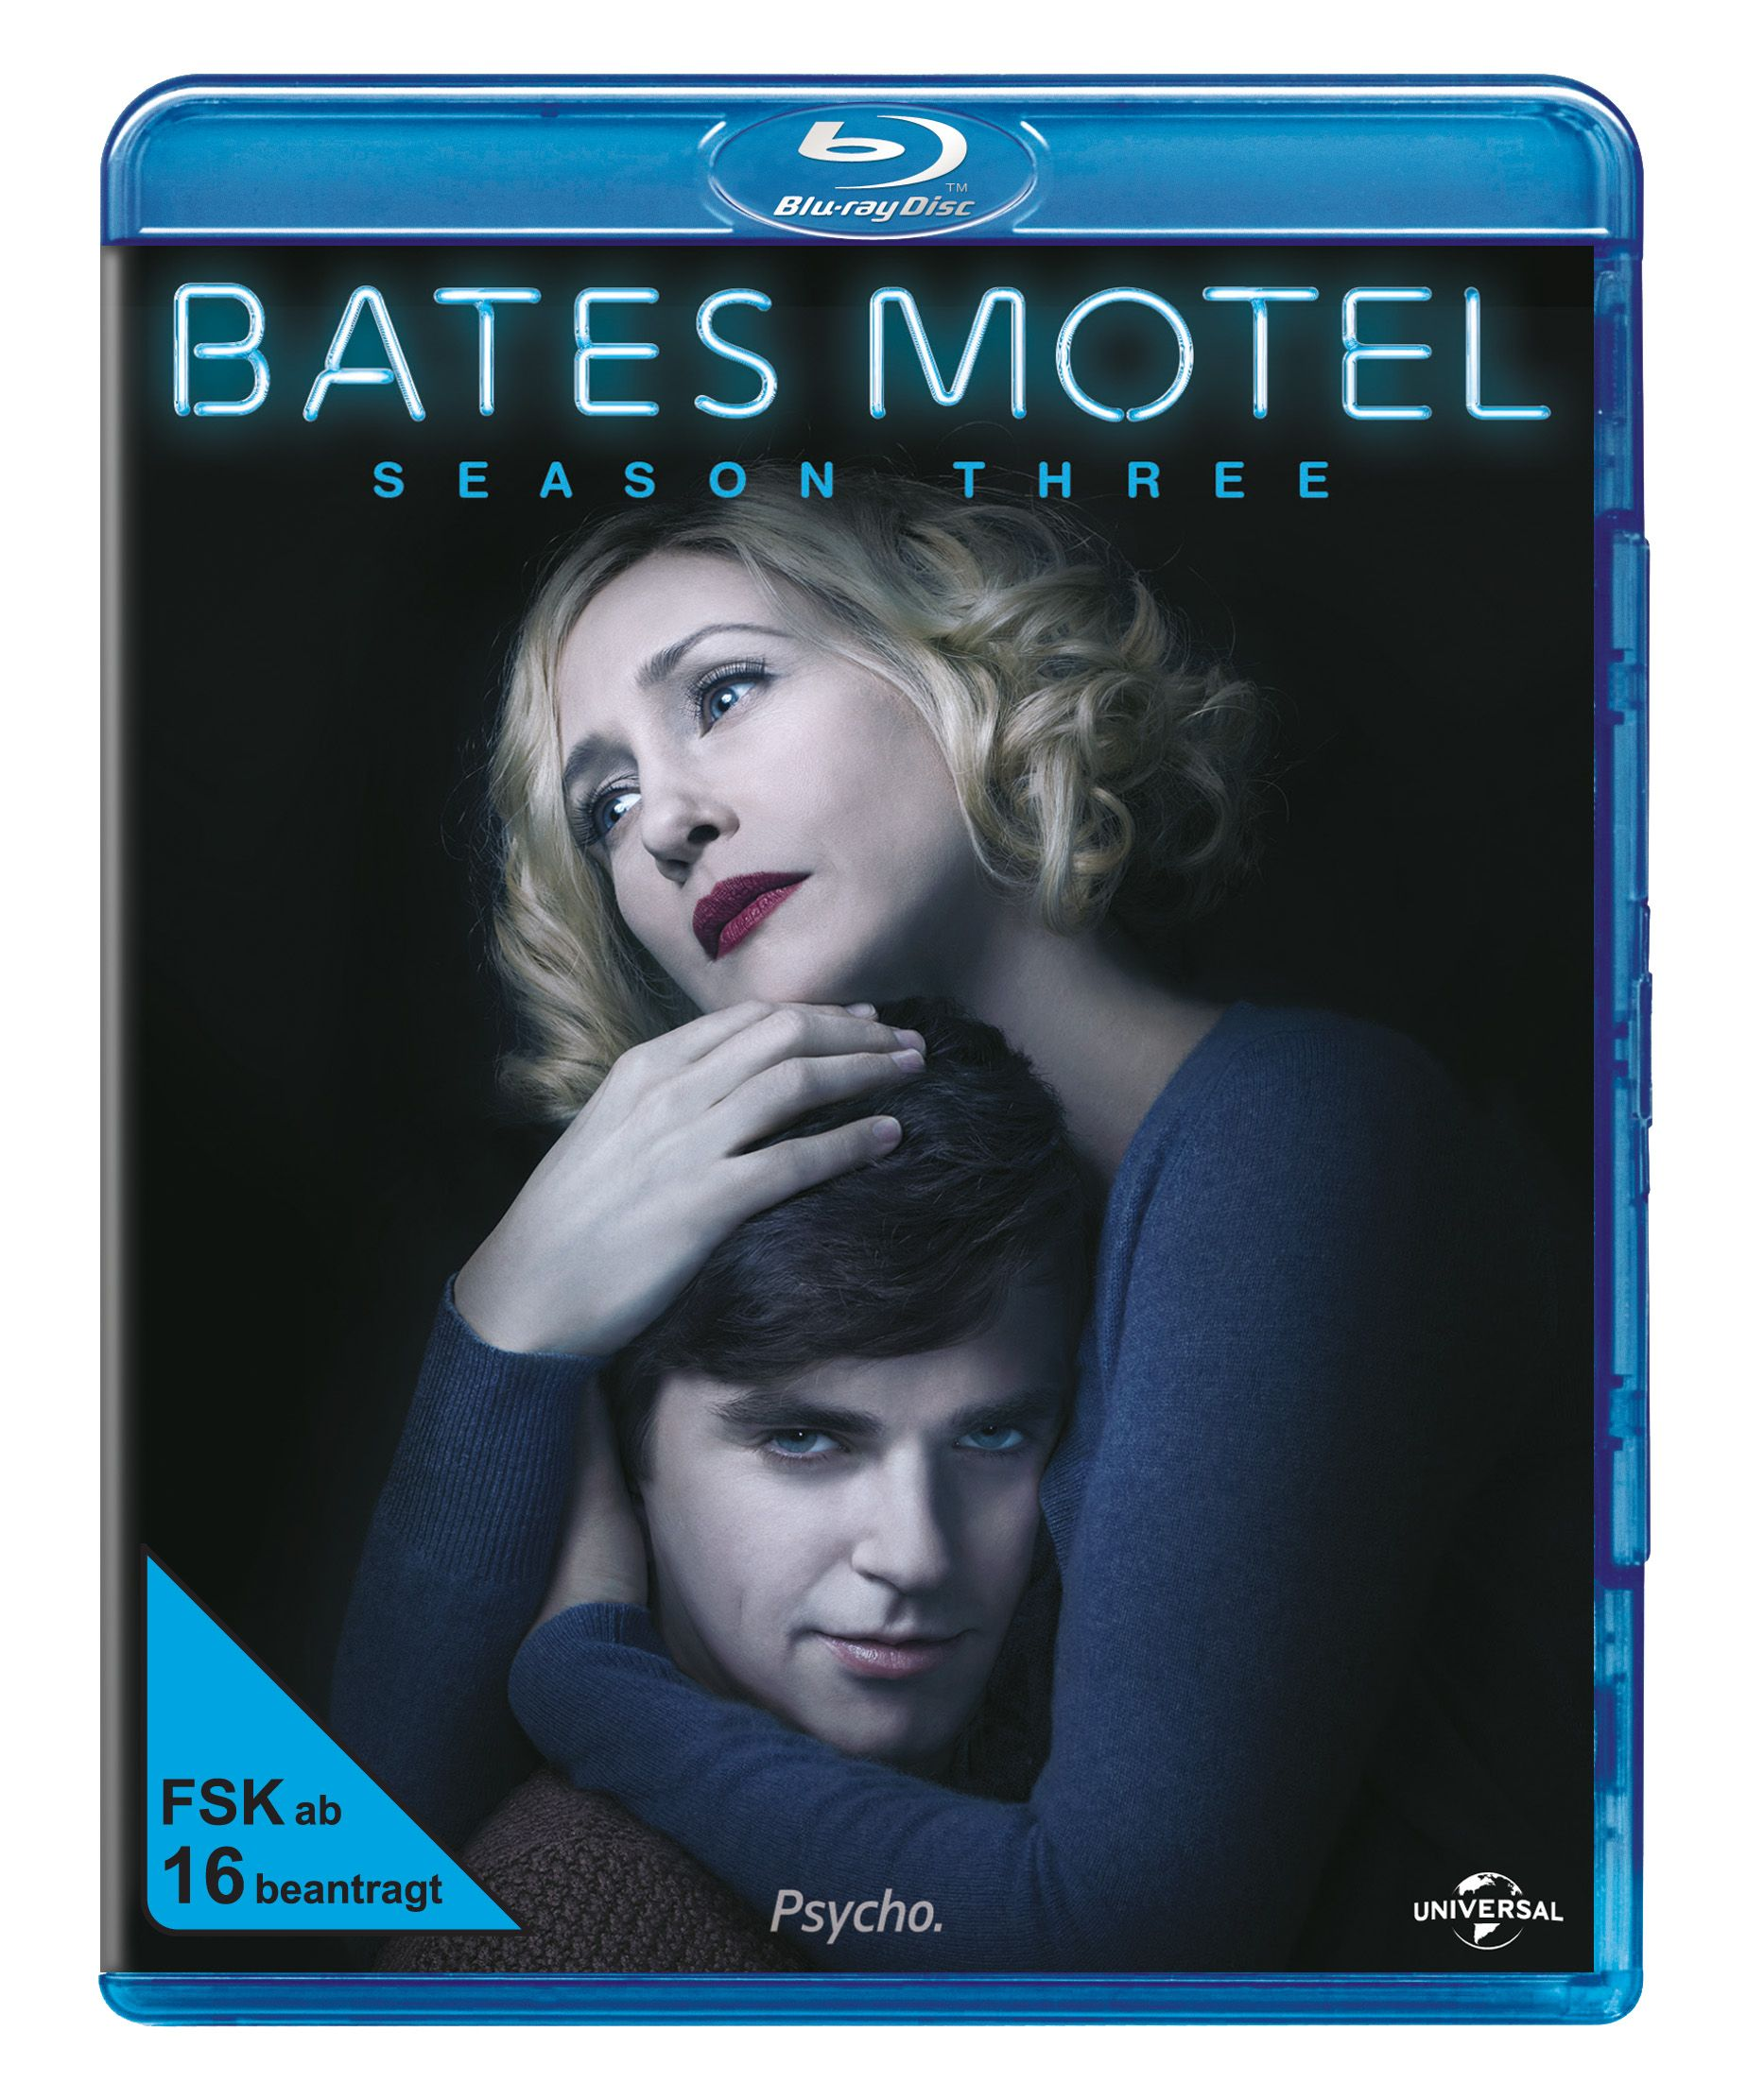 BATES MOTEL - Staffel 3 DVD Box - http://filmfreak.org/bates-motel-staffel-3-dvd-box/